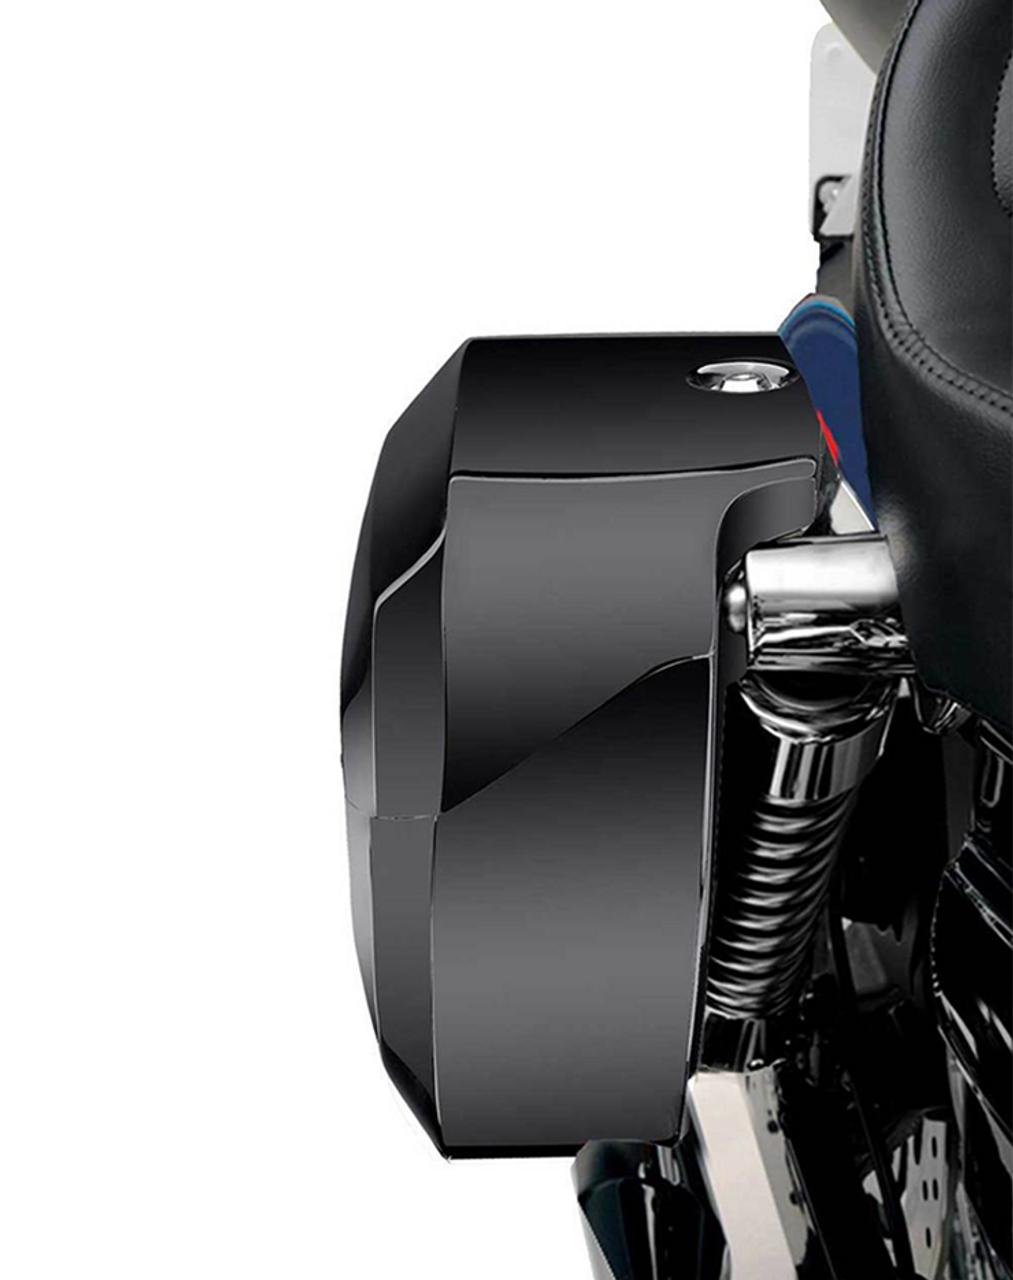 Honda VTX 1300 C Lamellar Extra Large Shock Cutout Saddlebag Shock Cutout View